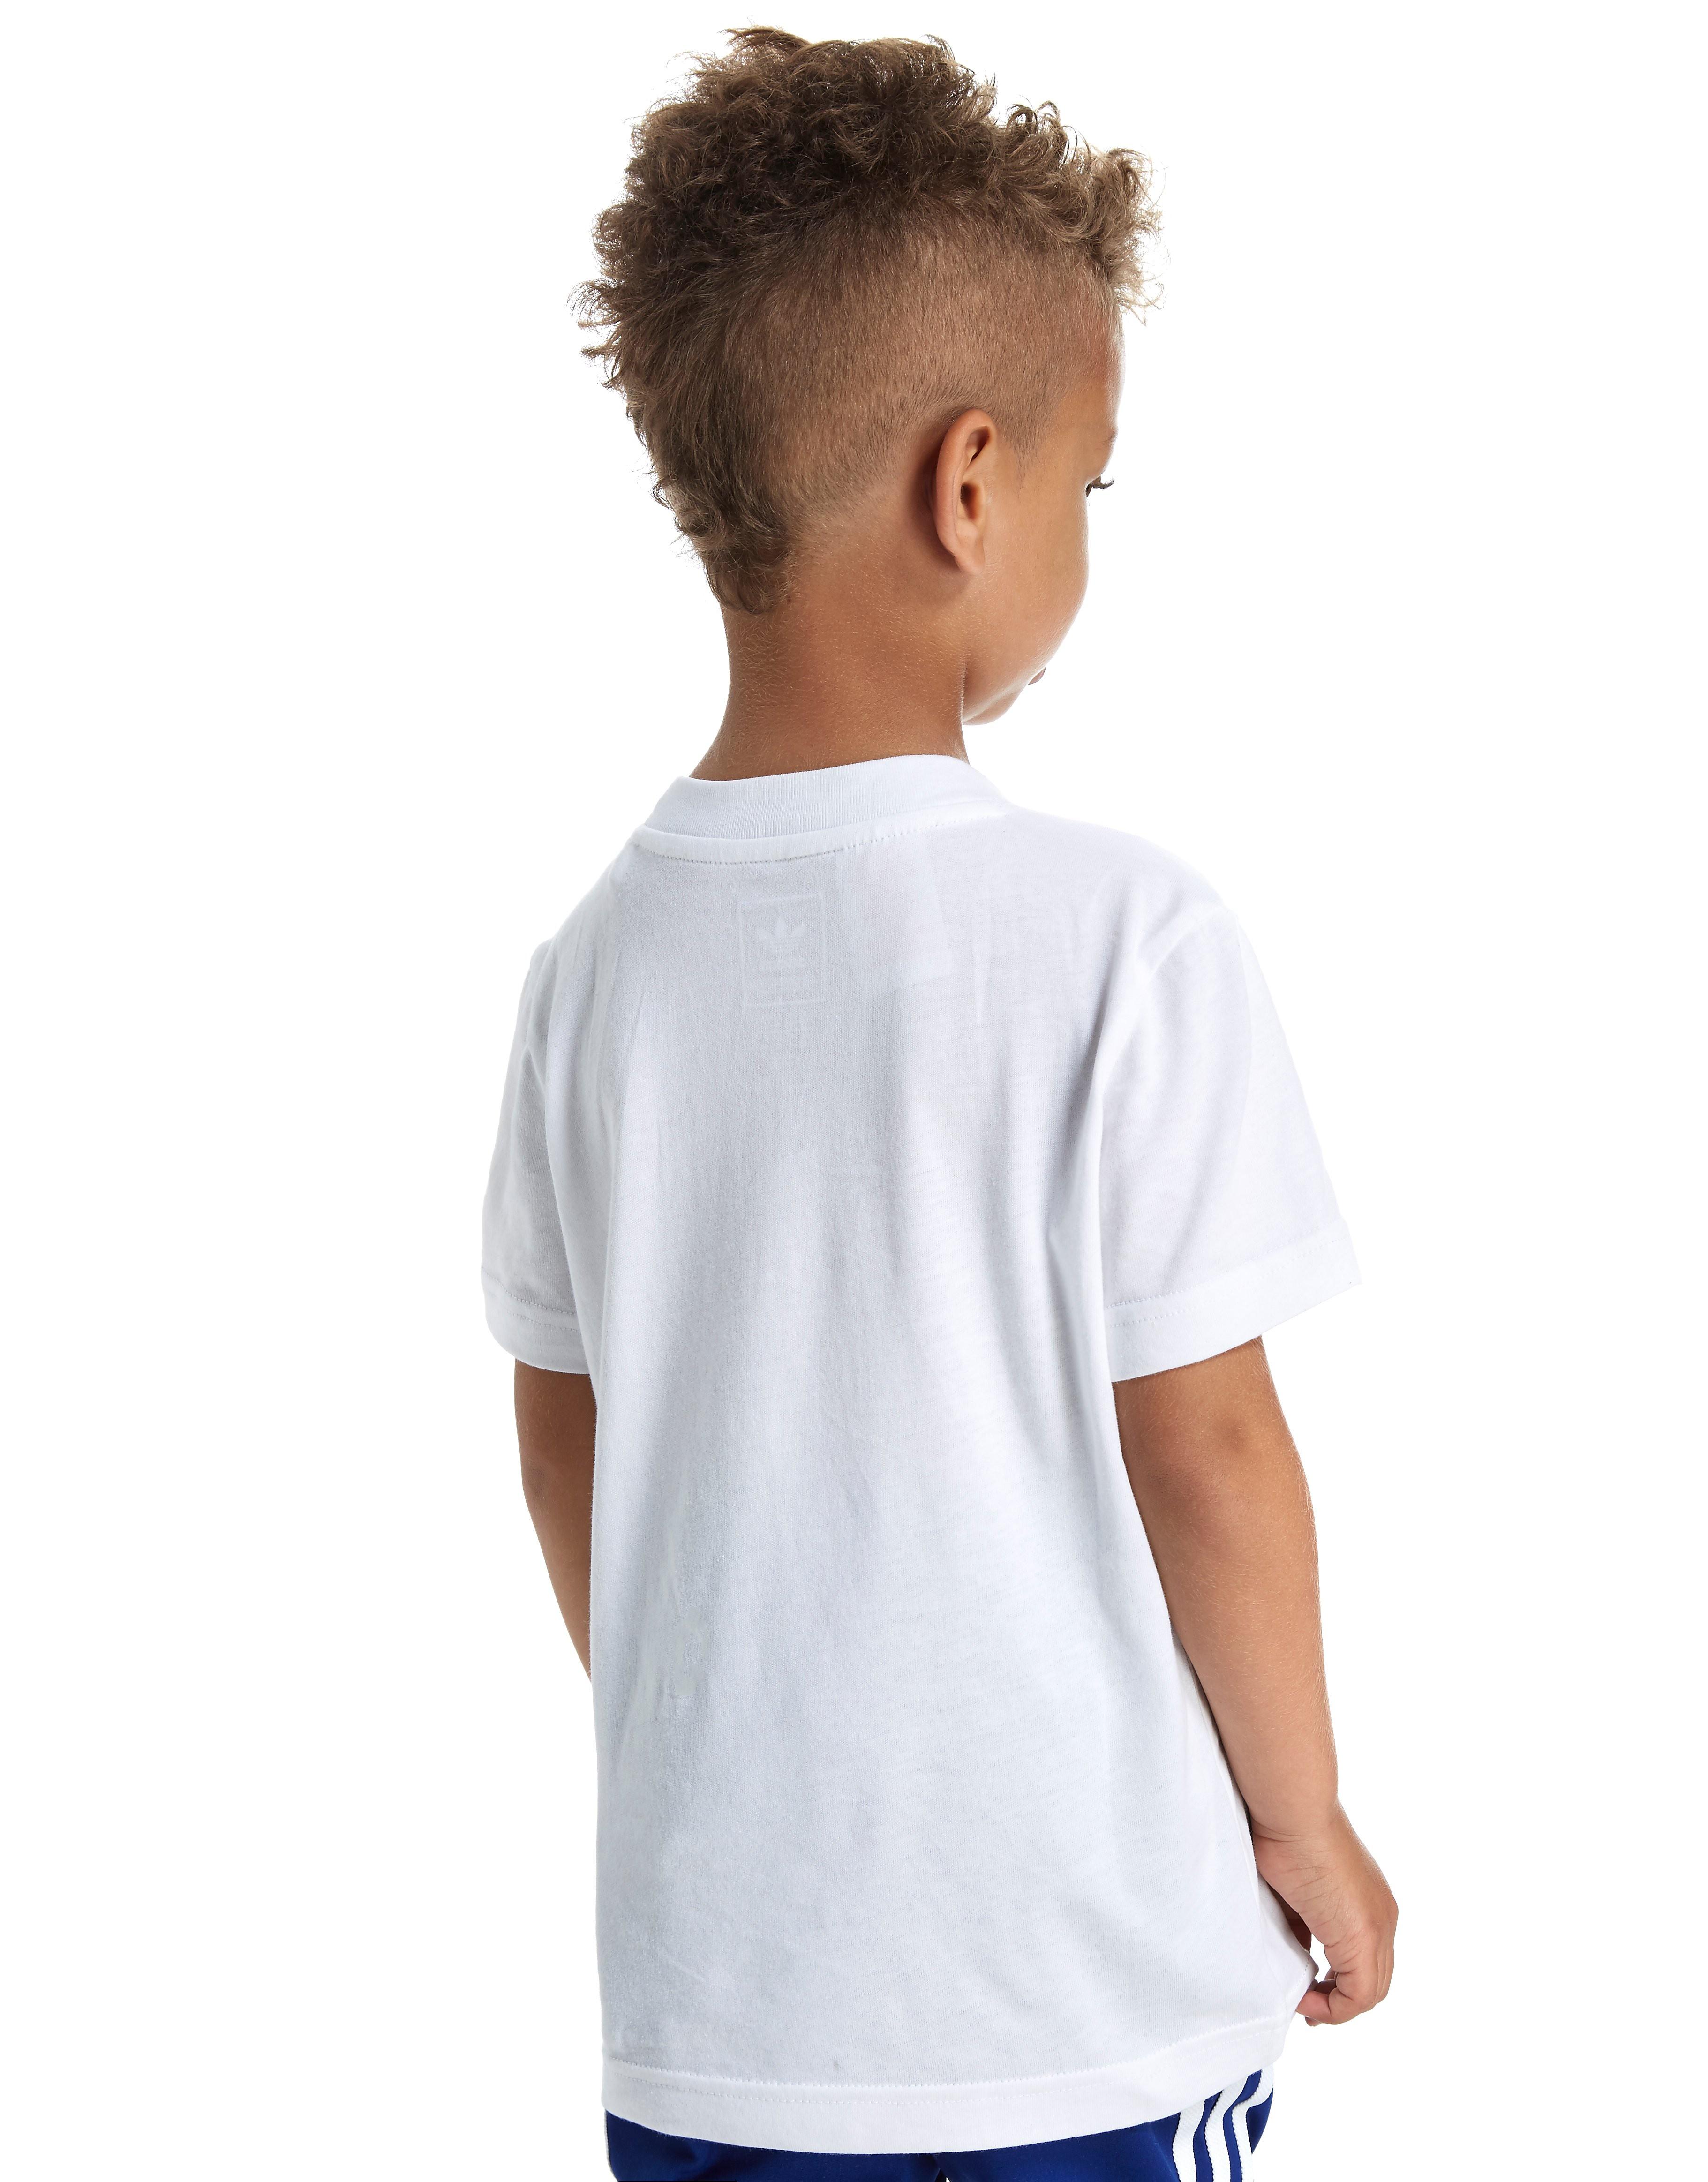 adidas Originals Trefoil T-Shirt Children